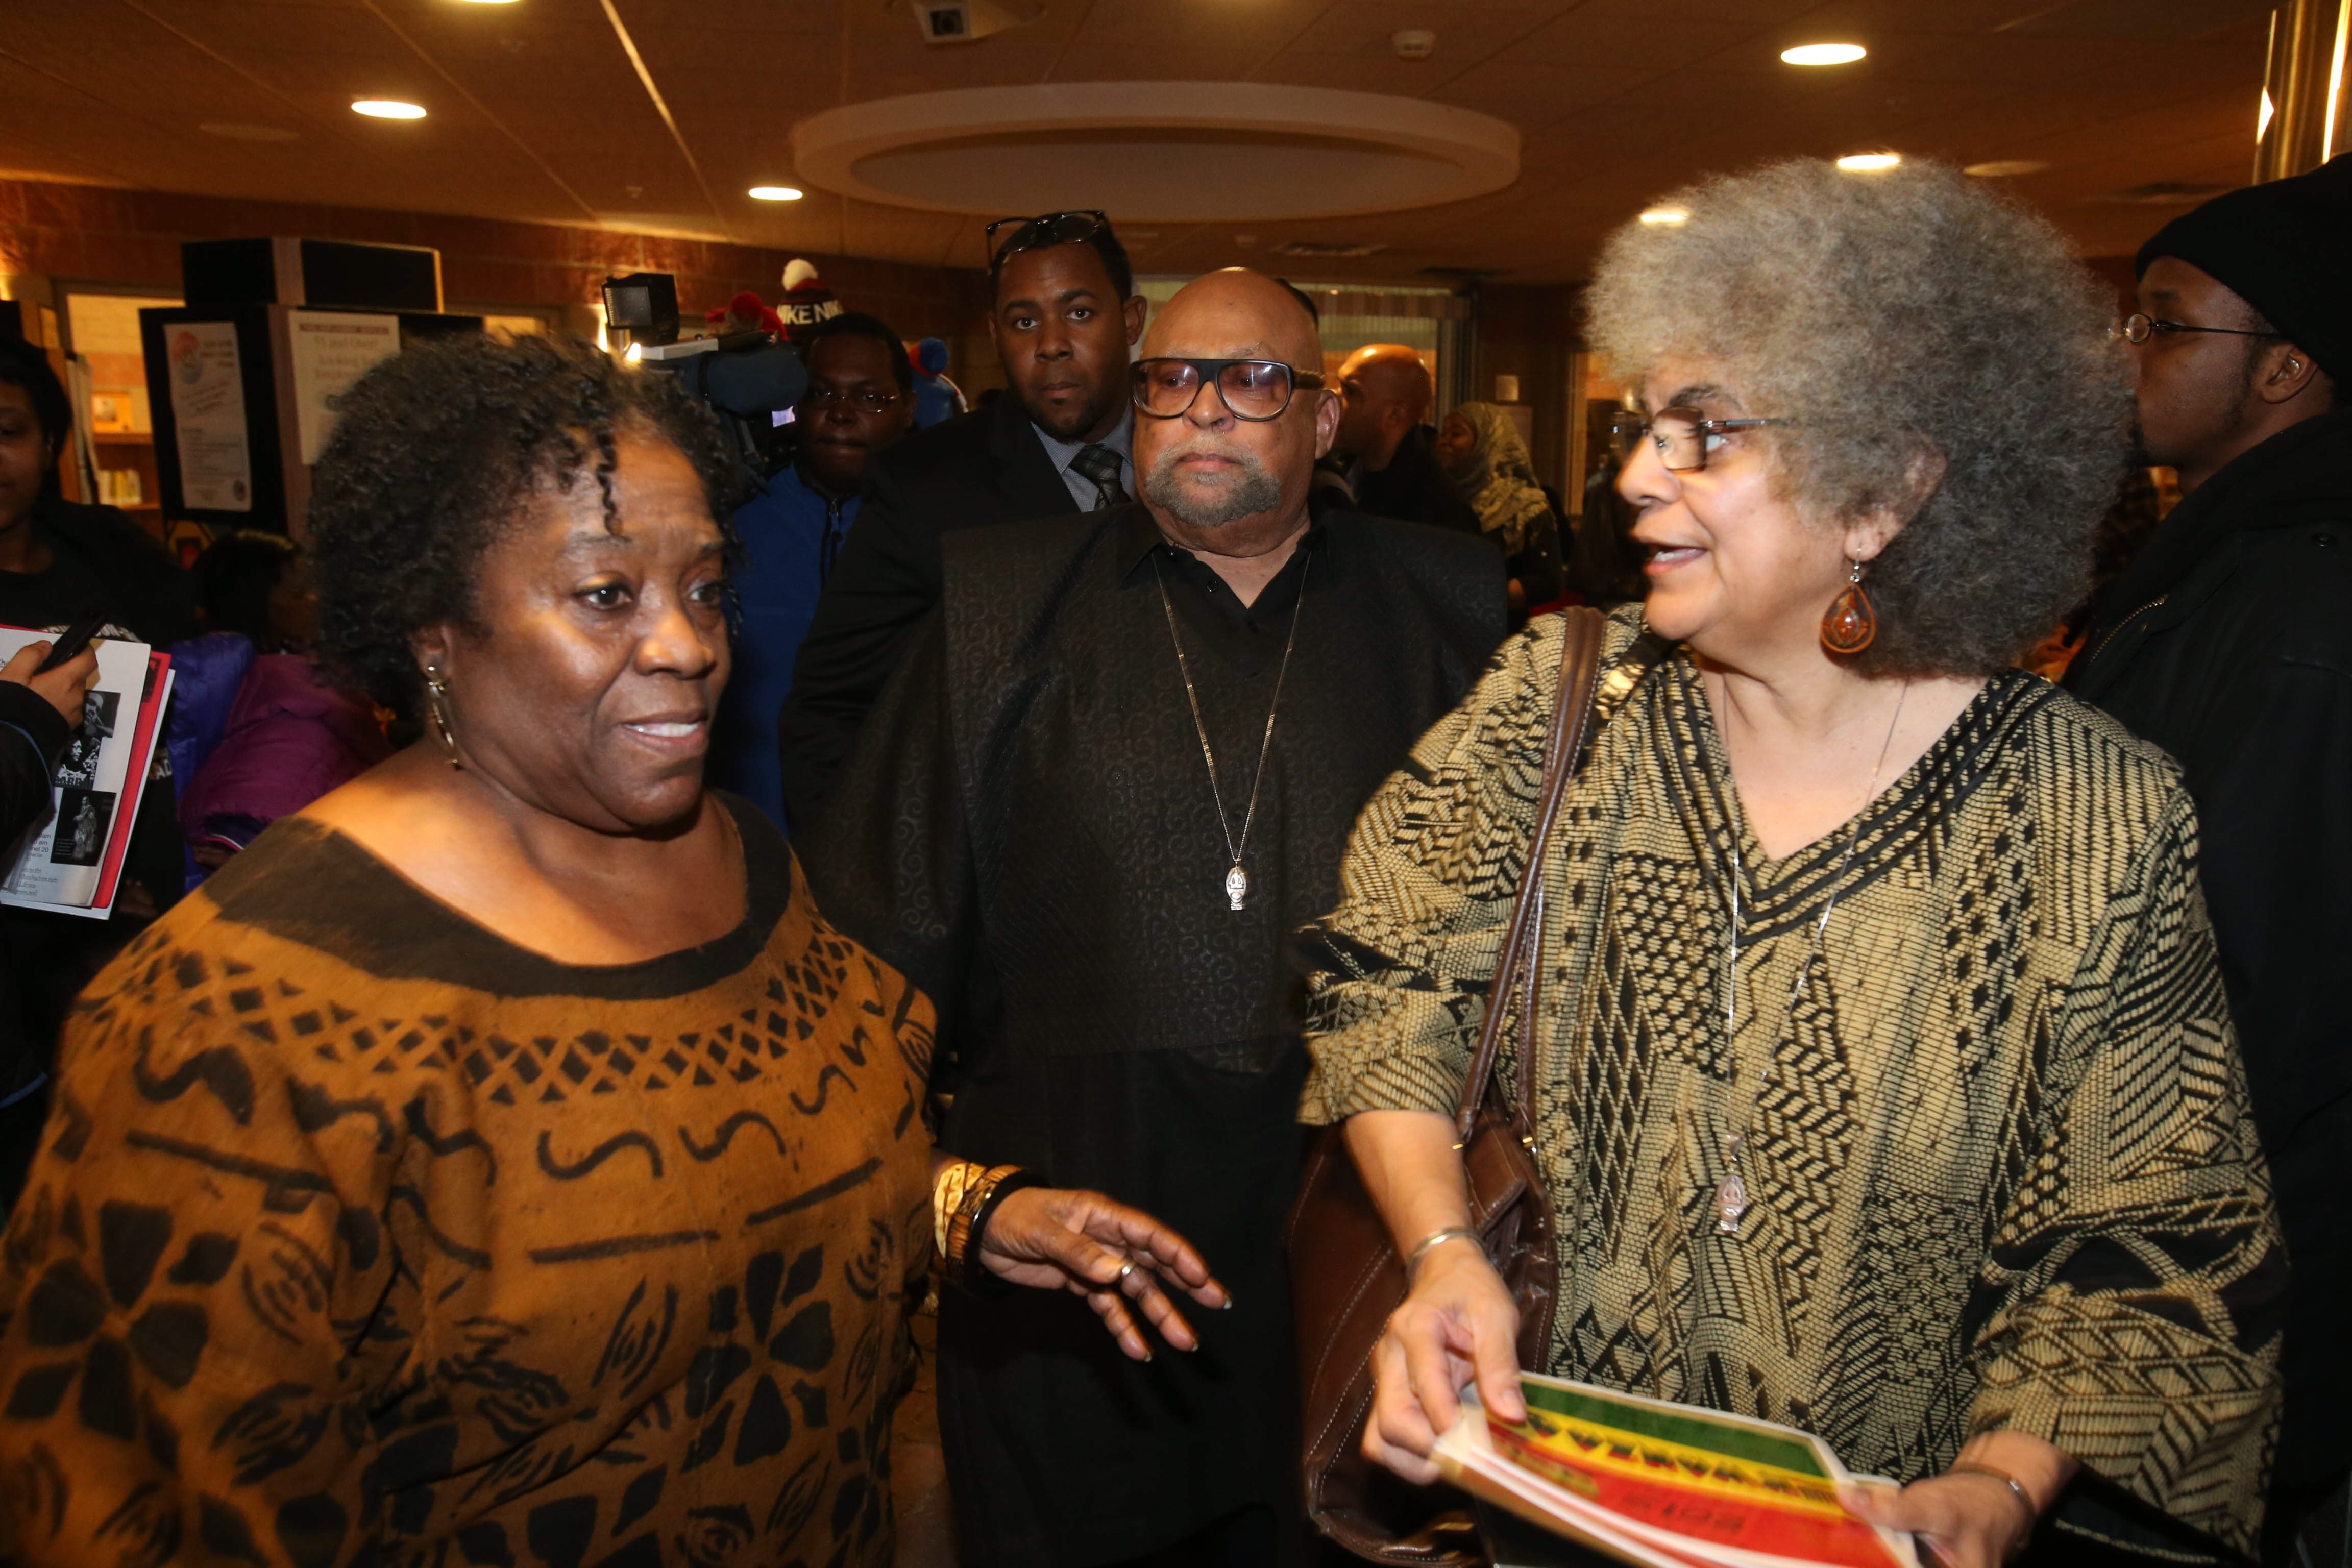 Taliba Asante, left, co-chairman of the Buffalo Kwanzaa Committee, Kwanzaa founder Maulana Karenga, center, and his wife, Tiamoyo, take part in Kwanzaa observances Sunday at the Frank E. Merriweather Jr. Library.